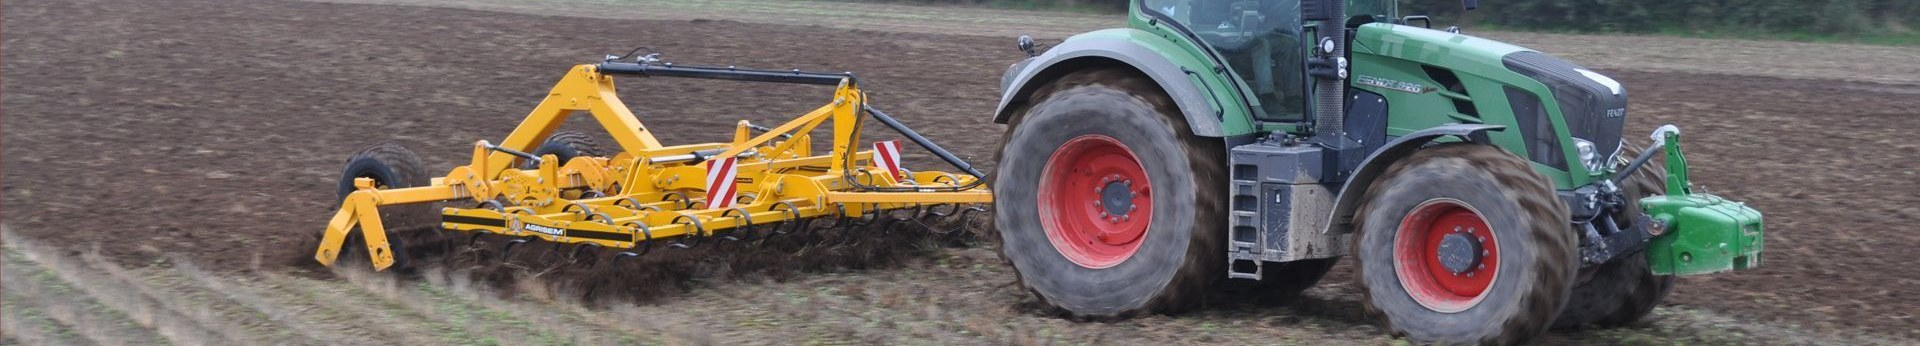 Żółty agregat agrisem vibromulch pracuje na polu z zielonym ciągnikiem Fendt korbanek.pl